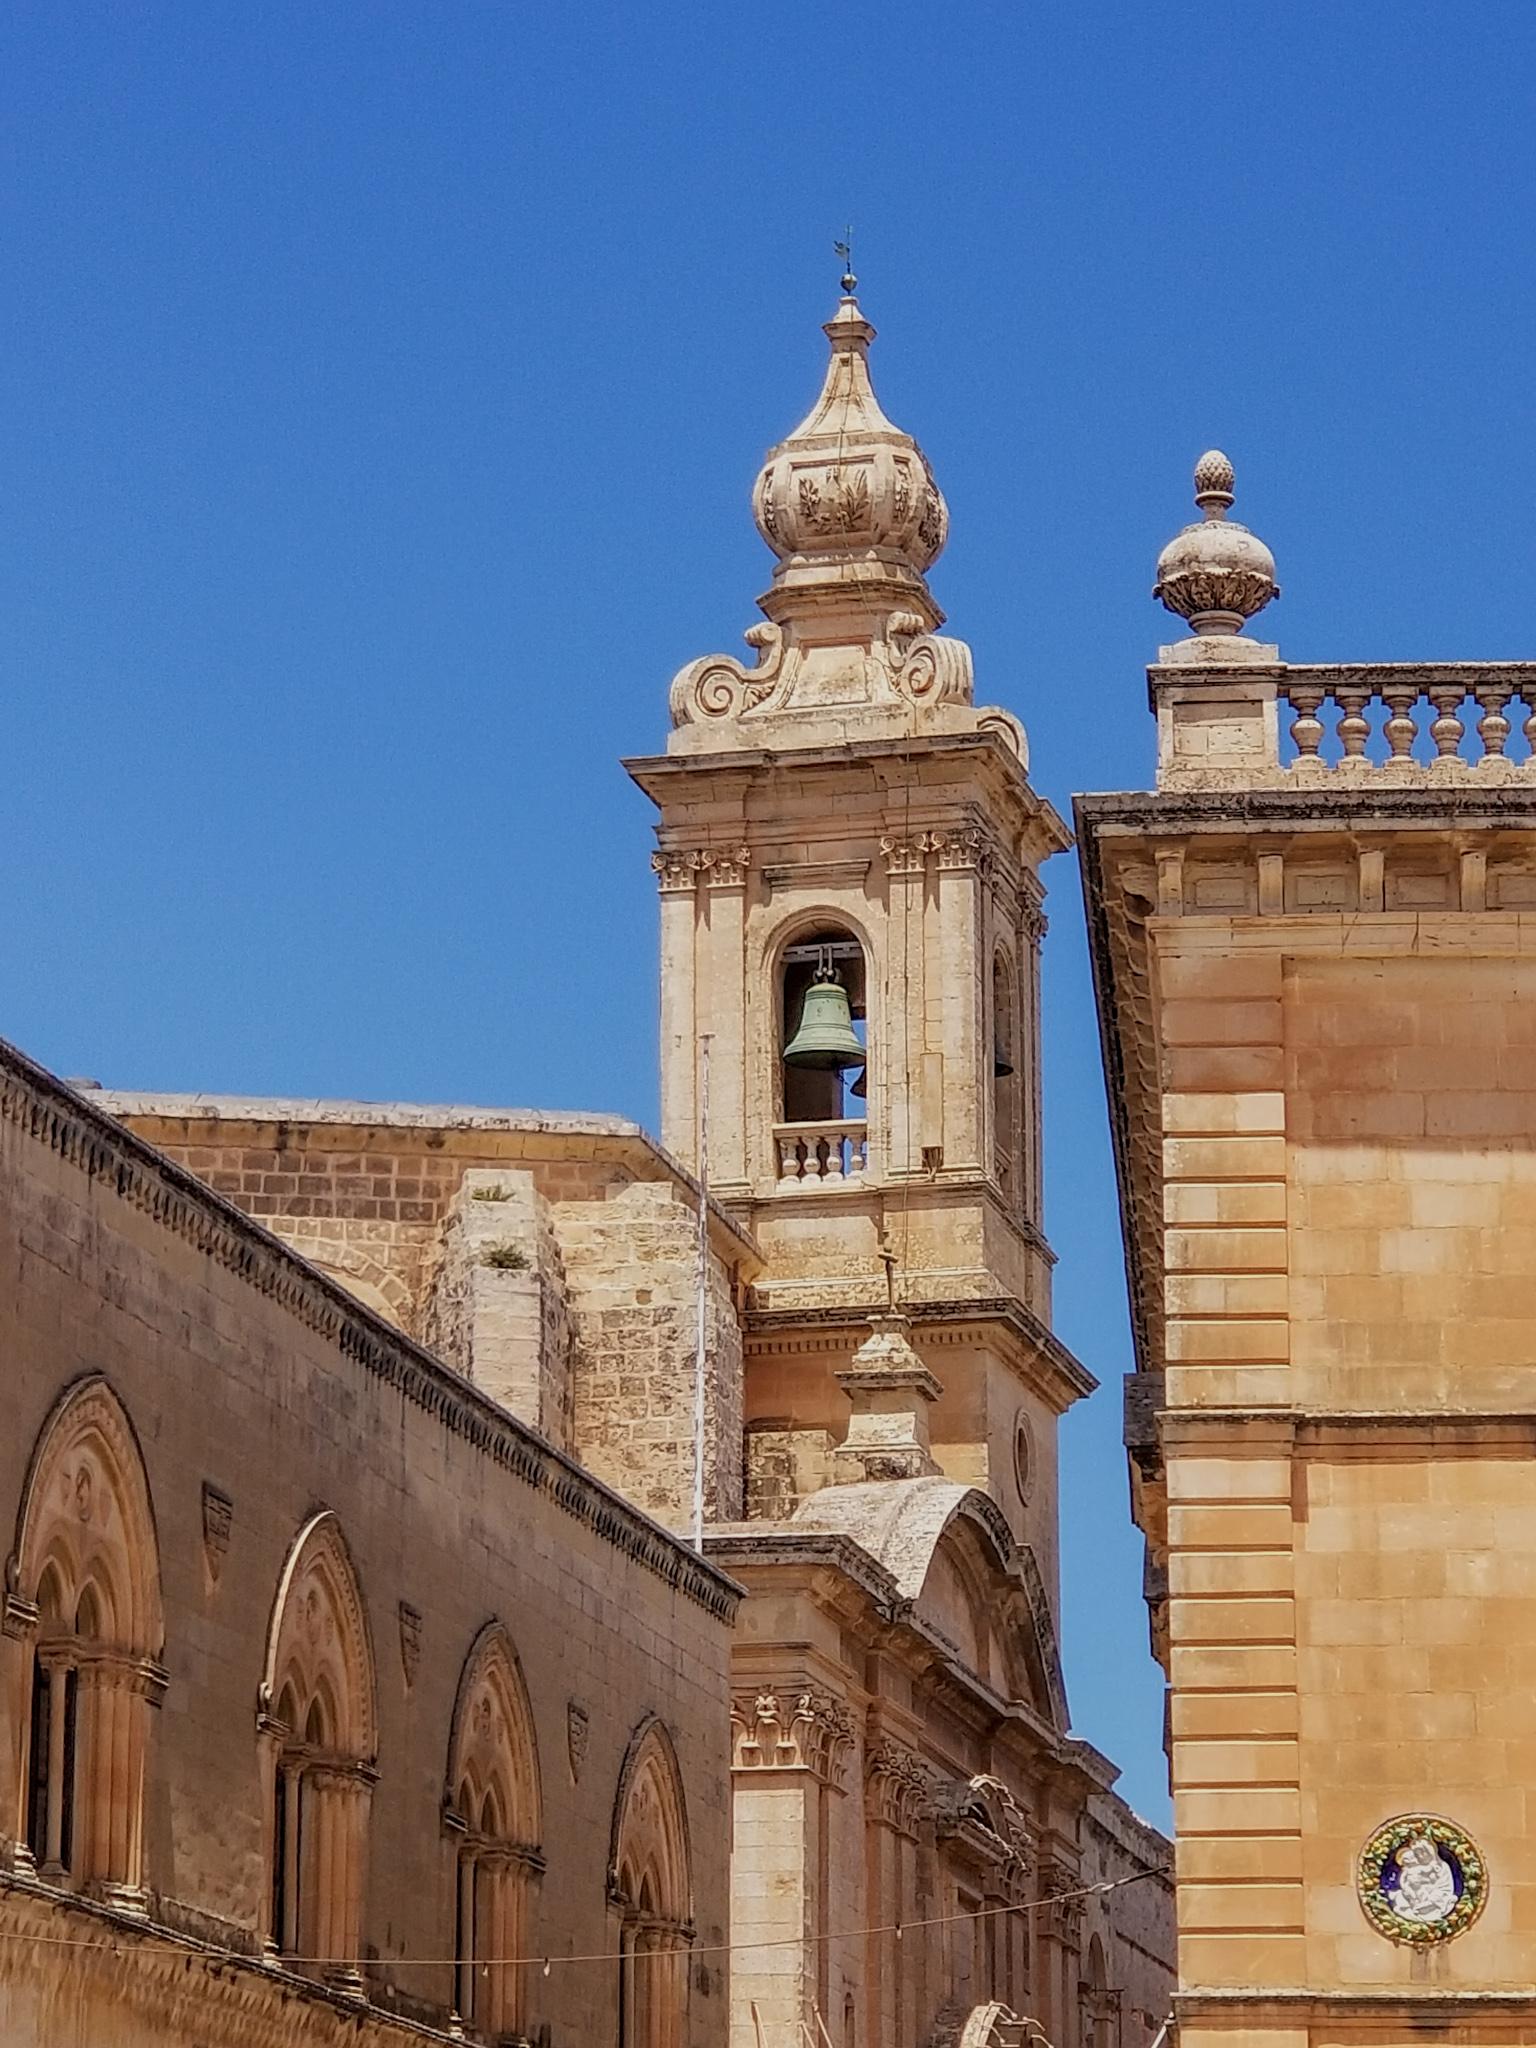 Mdina bell tower